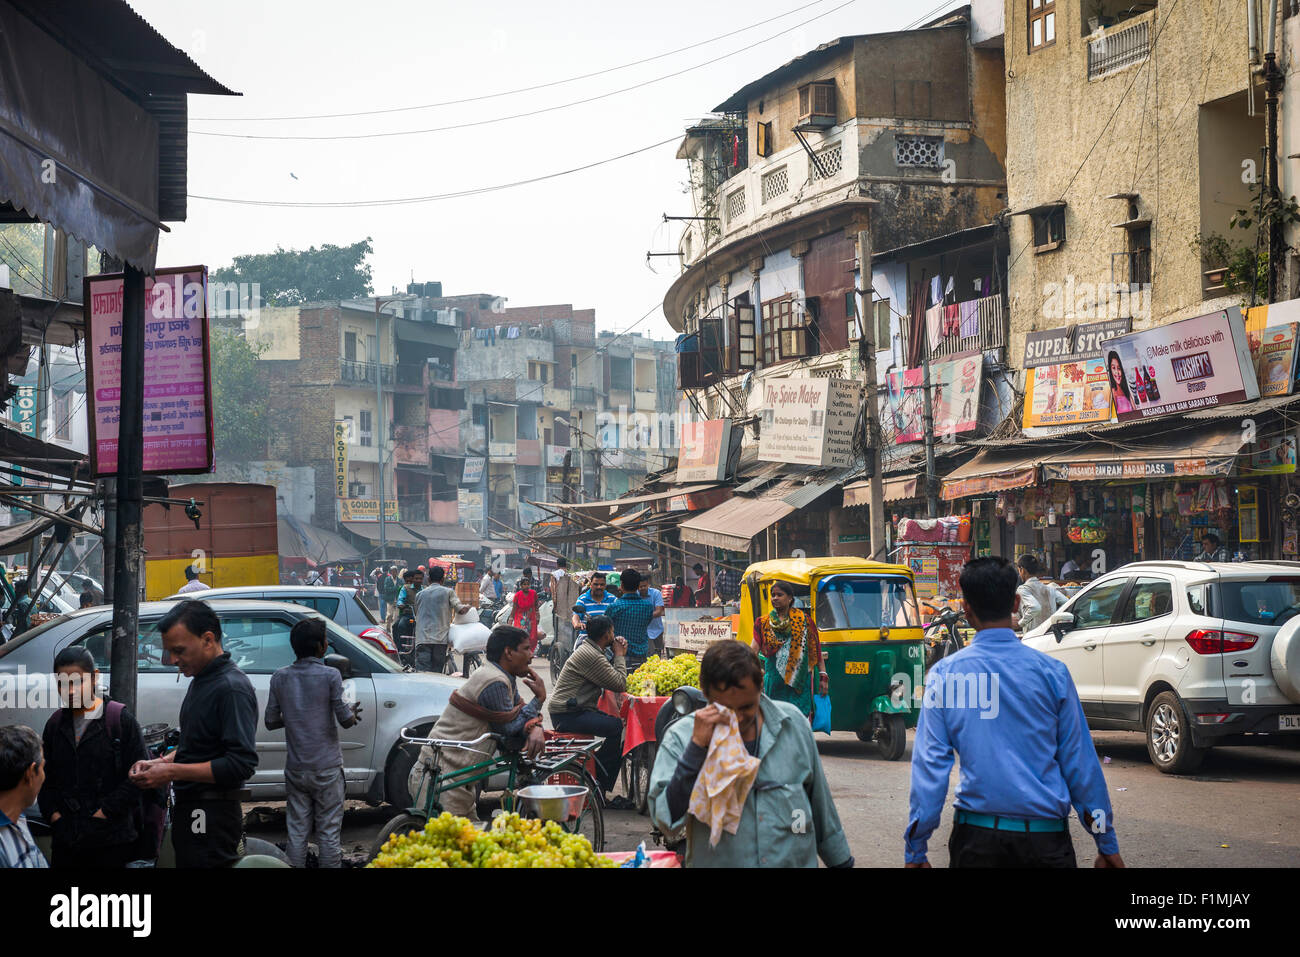 Strada trafficata vicino Bazaar Principale in Paharganj District di New Delhi, India Immagini Stock